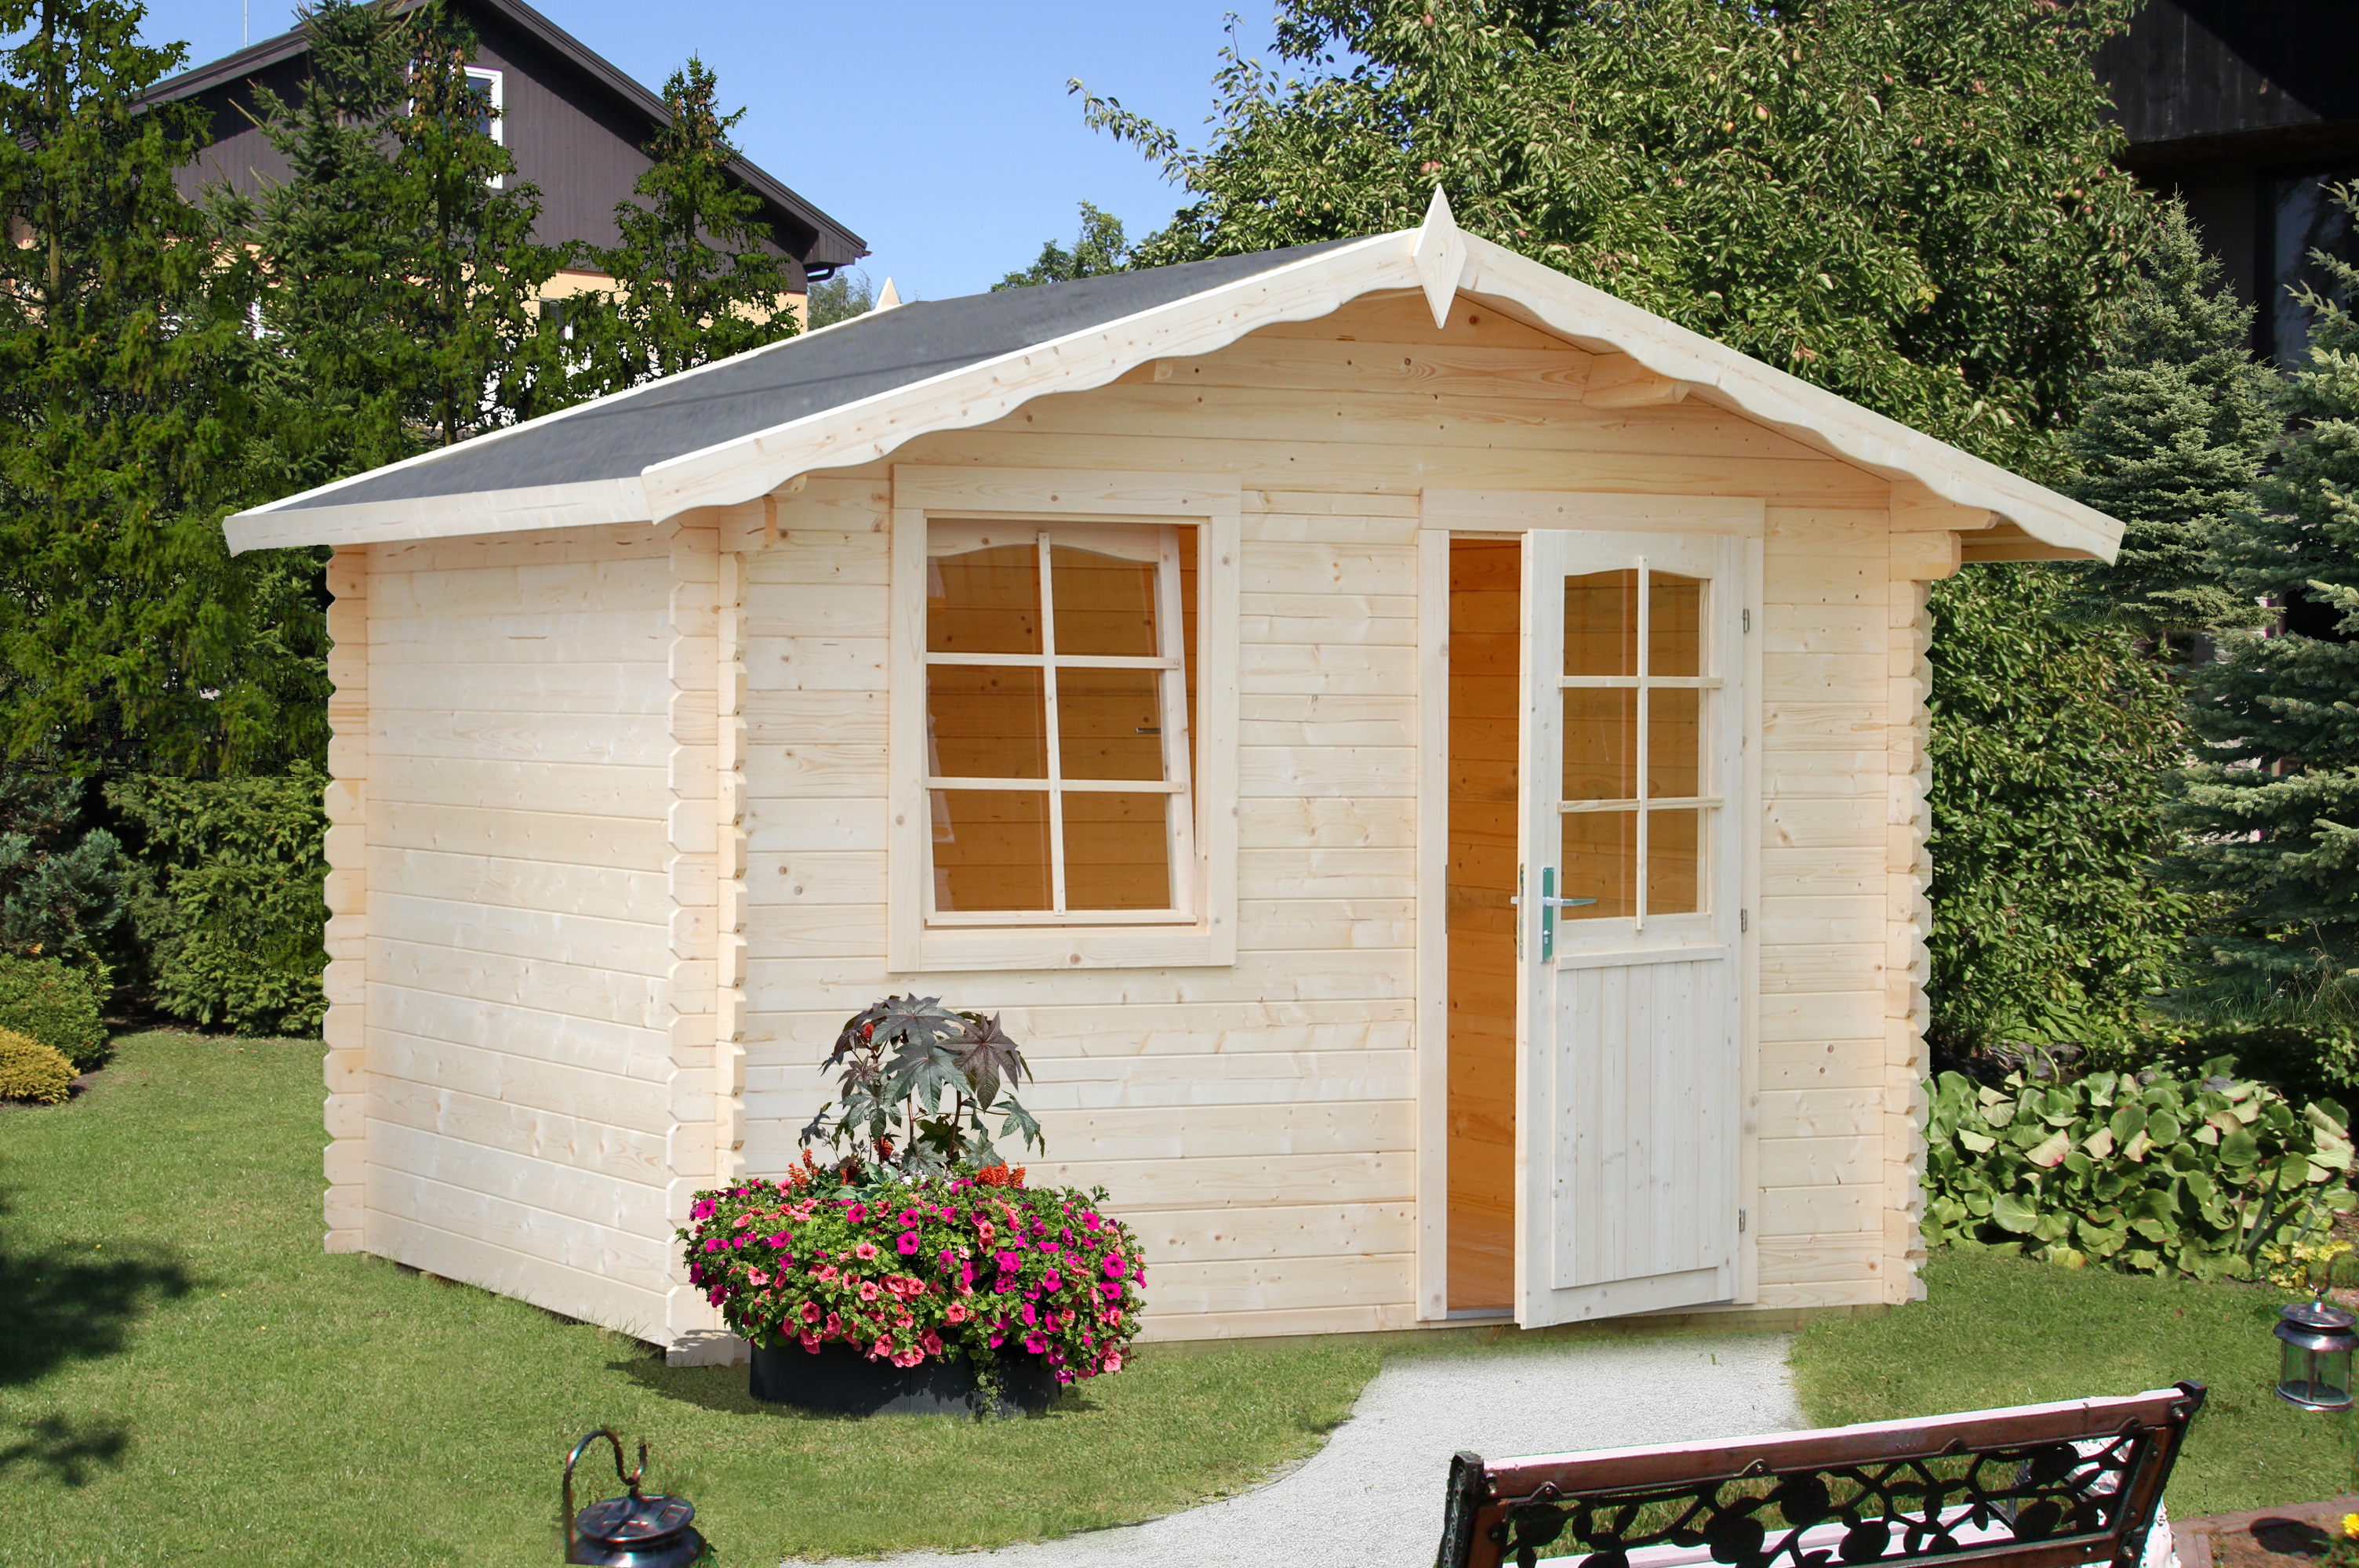 Palmako Gartenhäuser | Original Palmako Gartenhaus kaufen